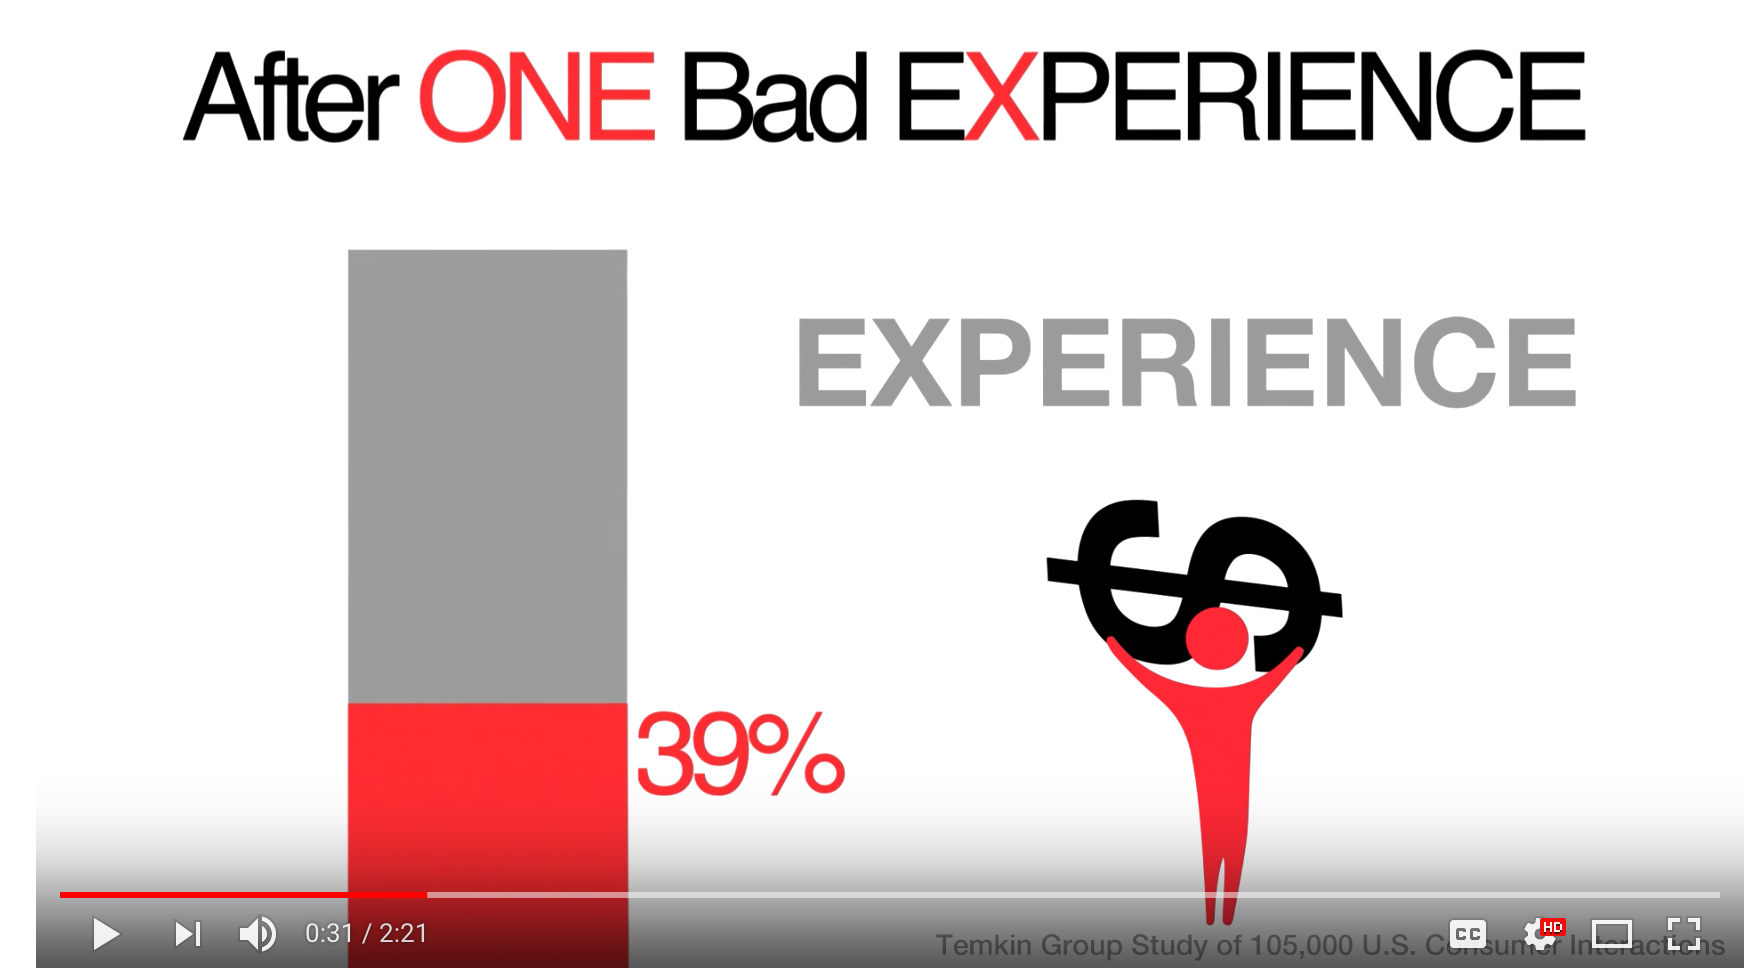 Customer Experience Matters - Temkin Group Video